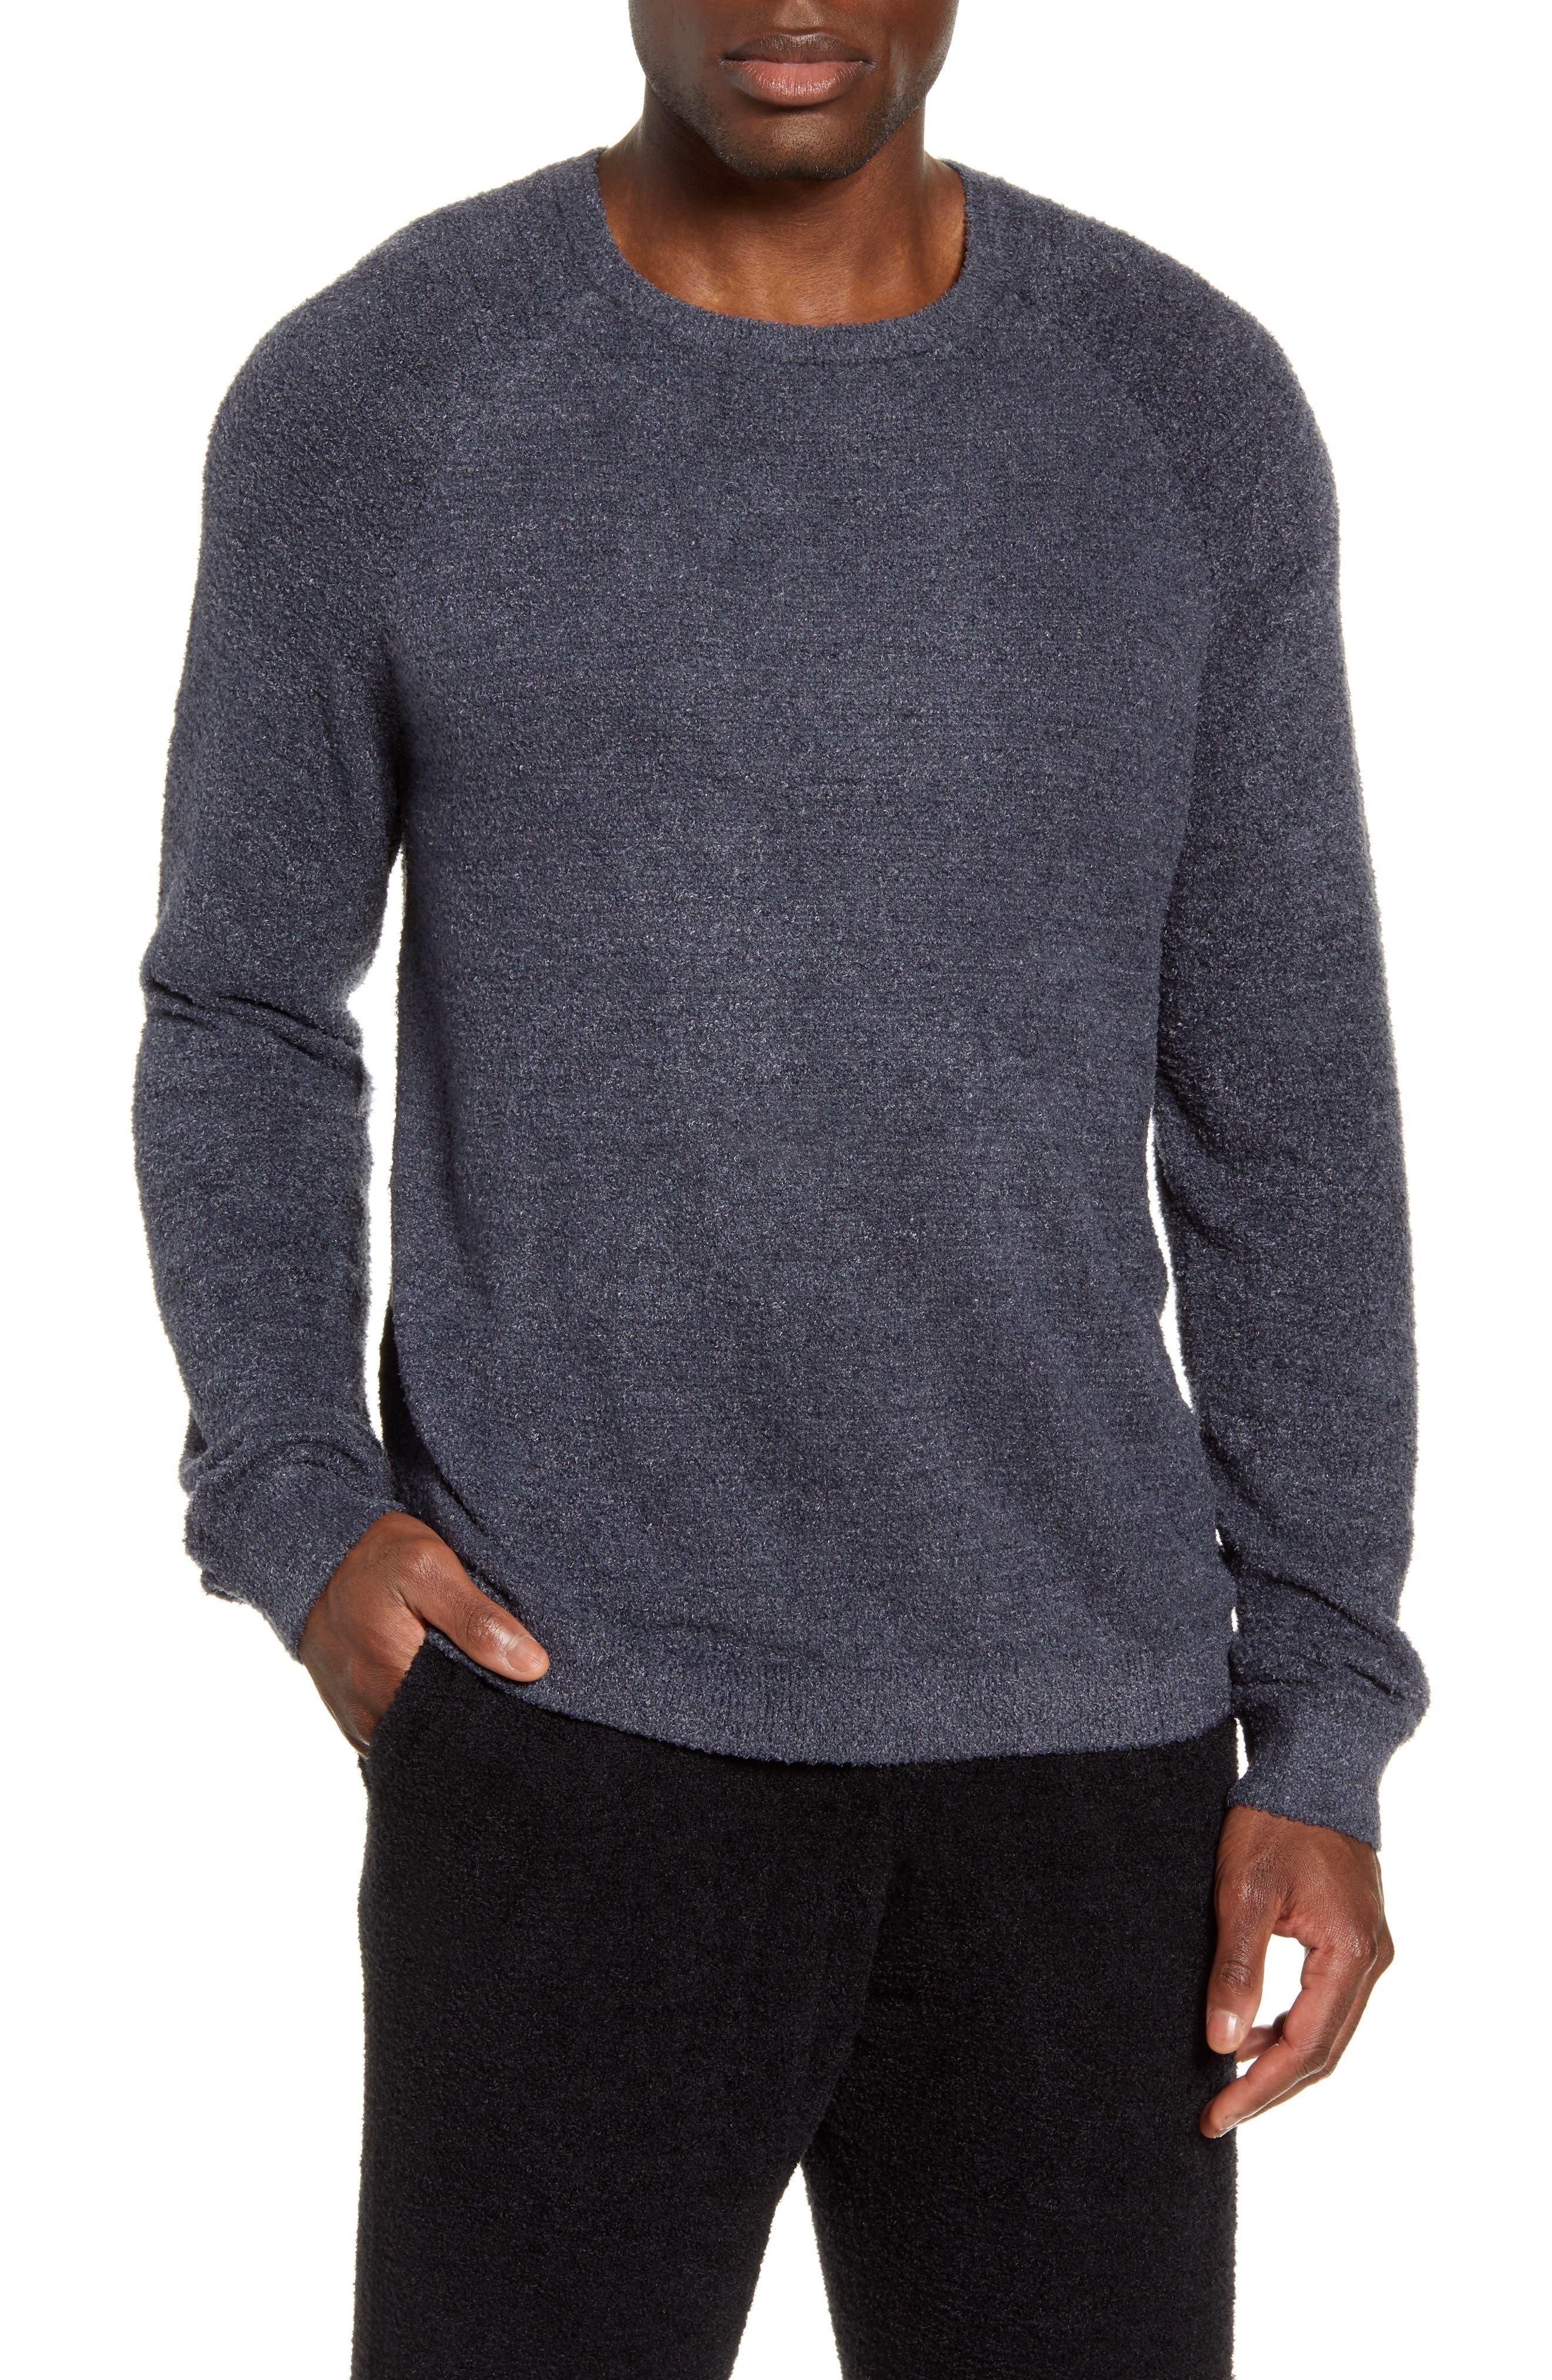 Men's Barefoot Dreams Cozychic(TM) Lite Raglan Sweater